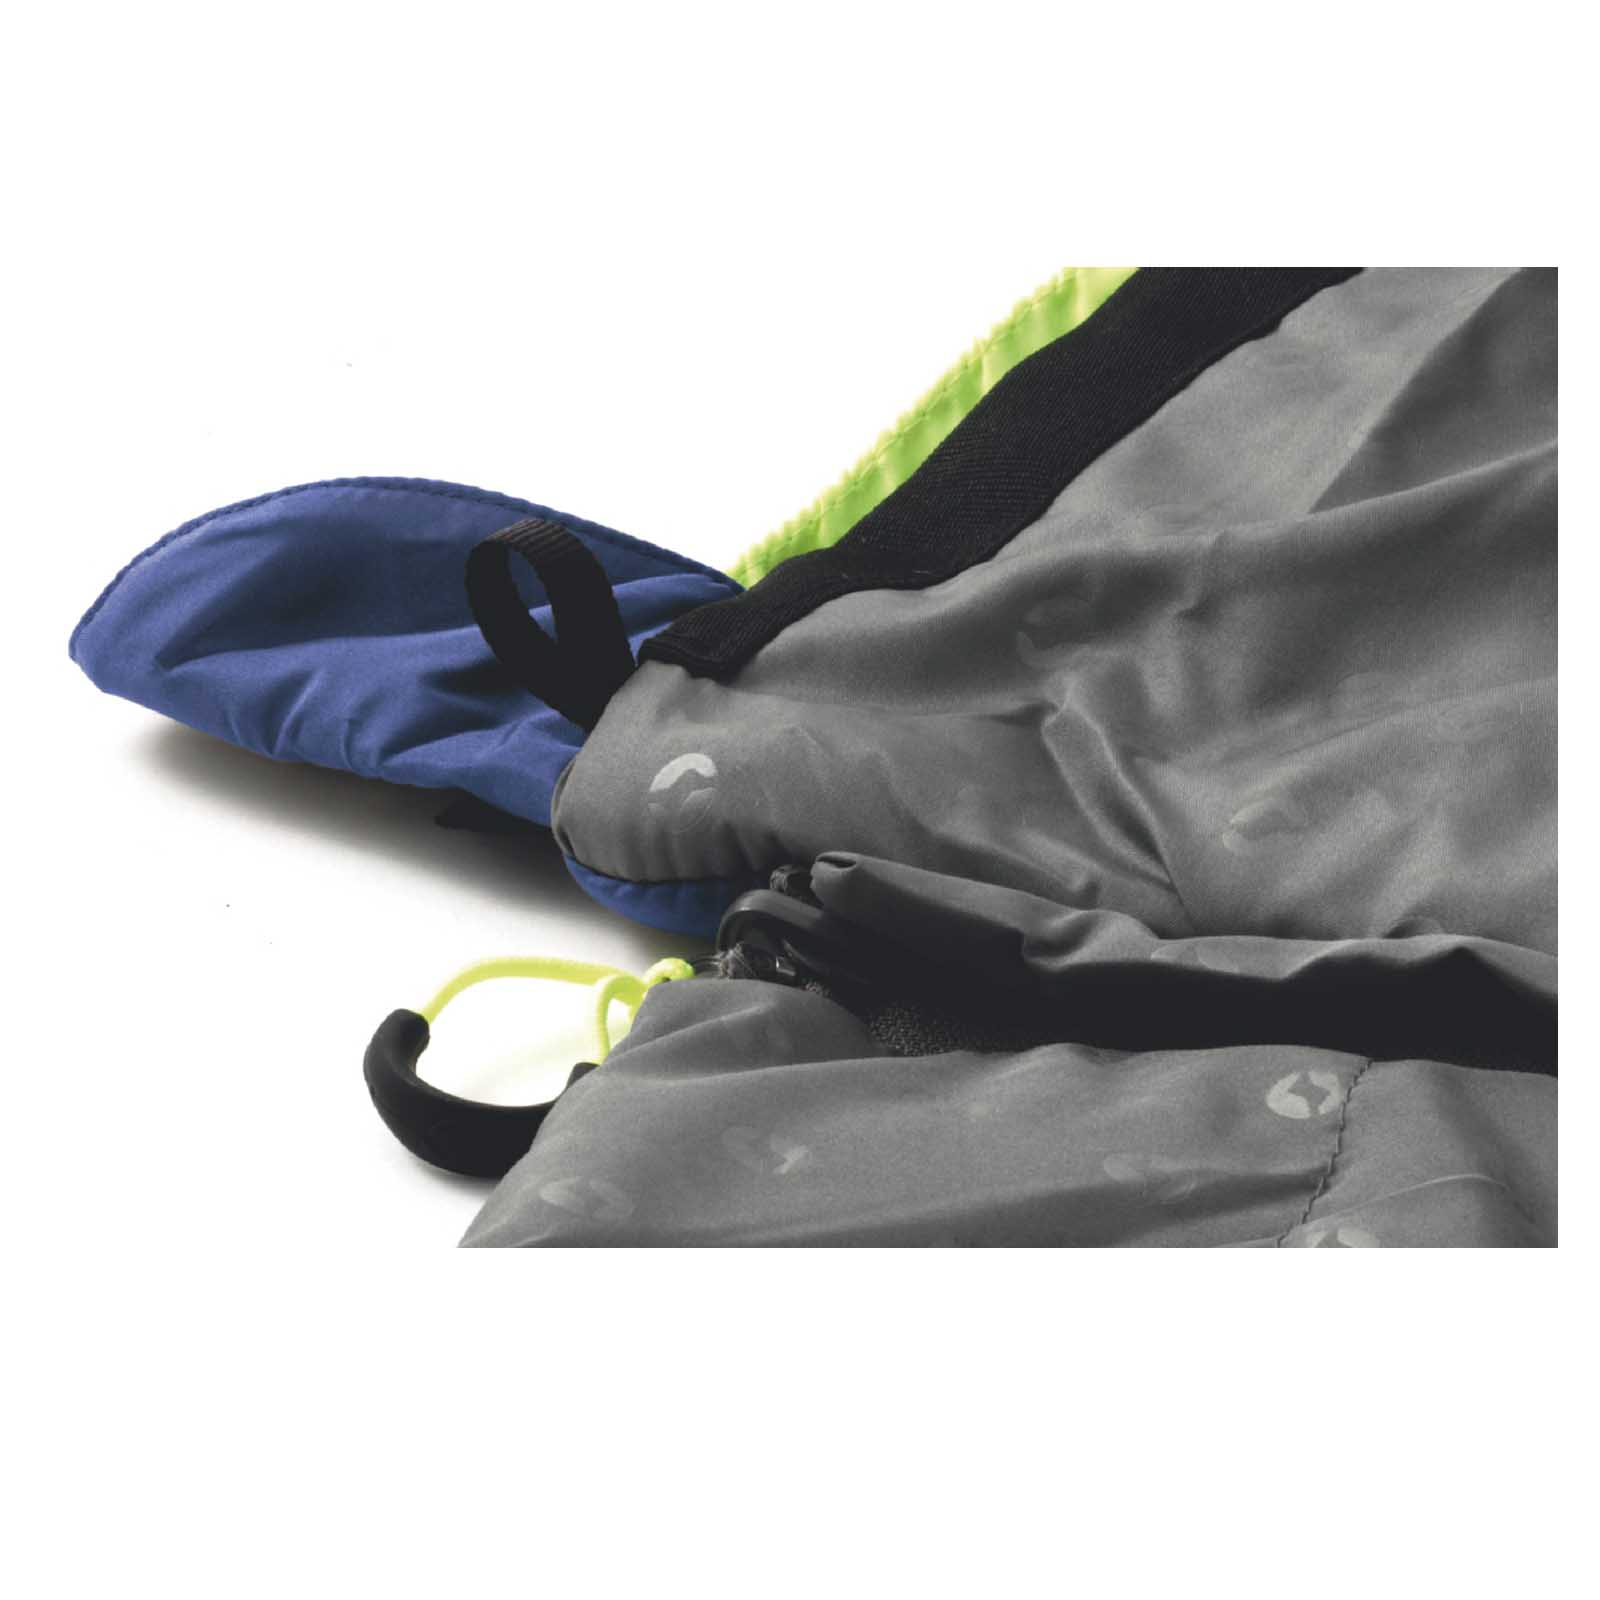 Contour-Lux-Doppel-Deckenschlafsack-OUTWELL-inkl-Kissen-Schlafsack-Camping